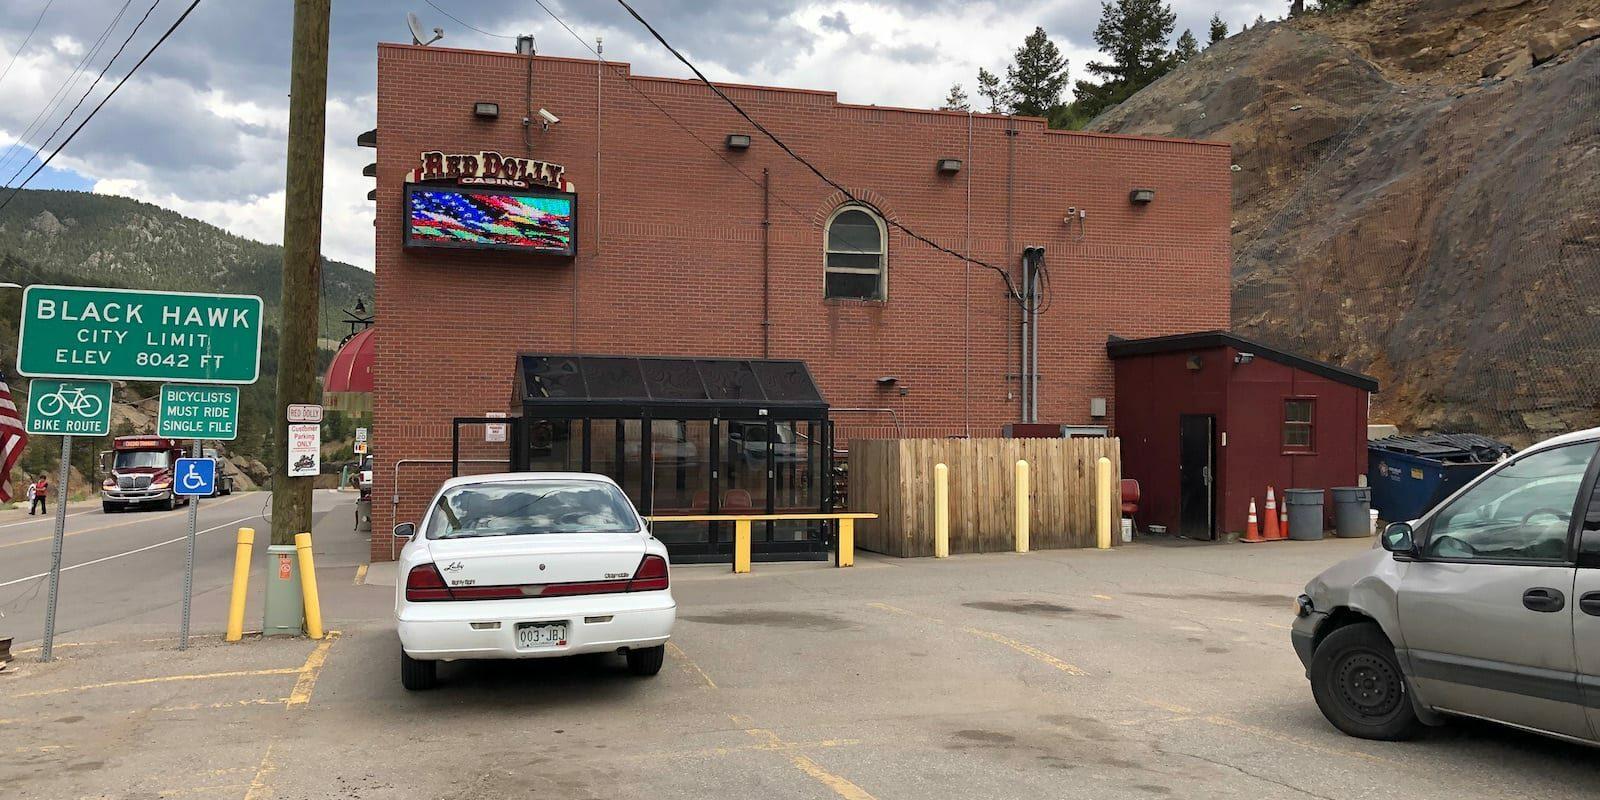 Red Dolly Casino Black Hawk CO Parking Lot